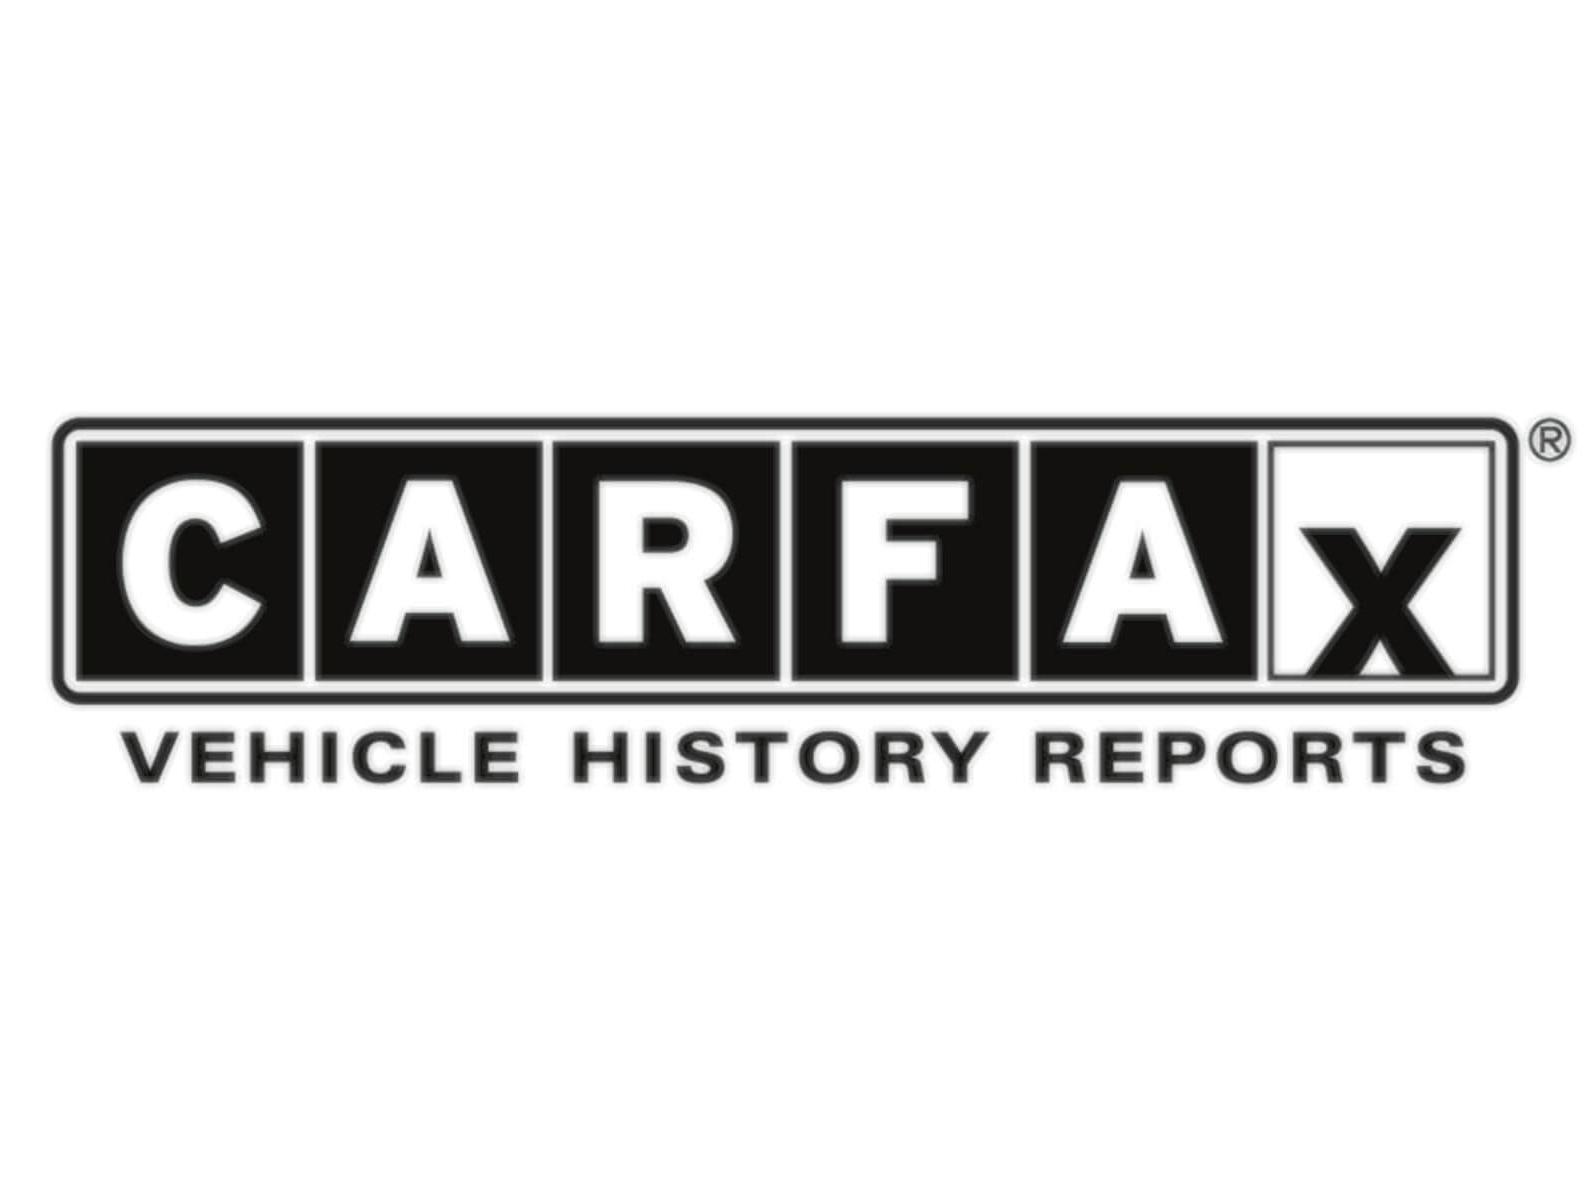 Carfax logo. Vehicle History Reports